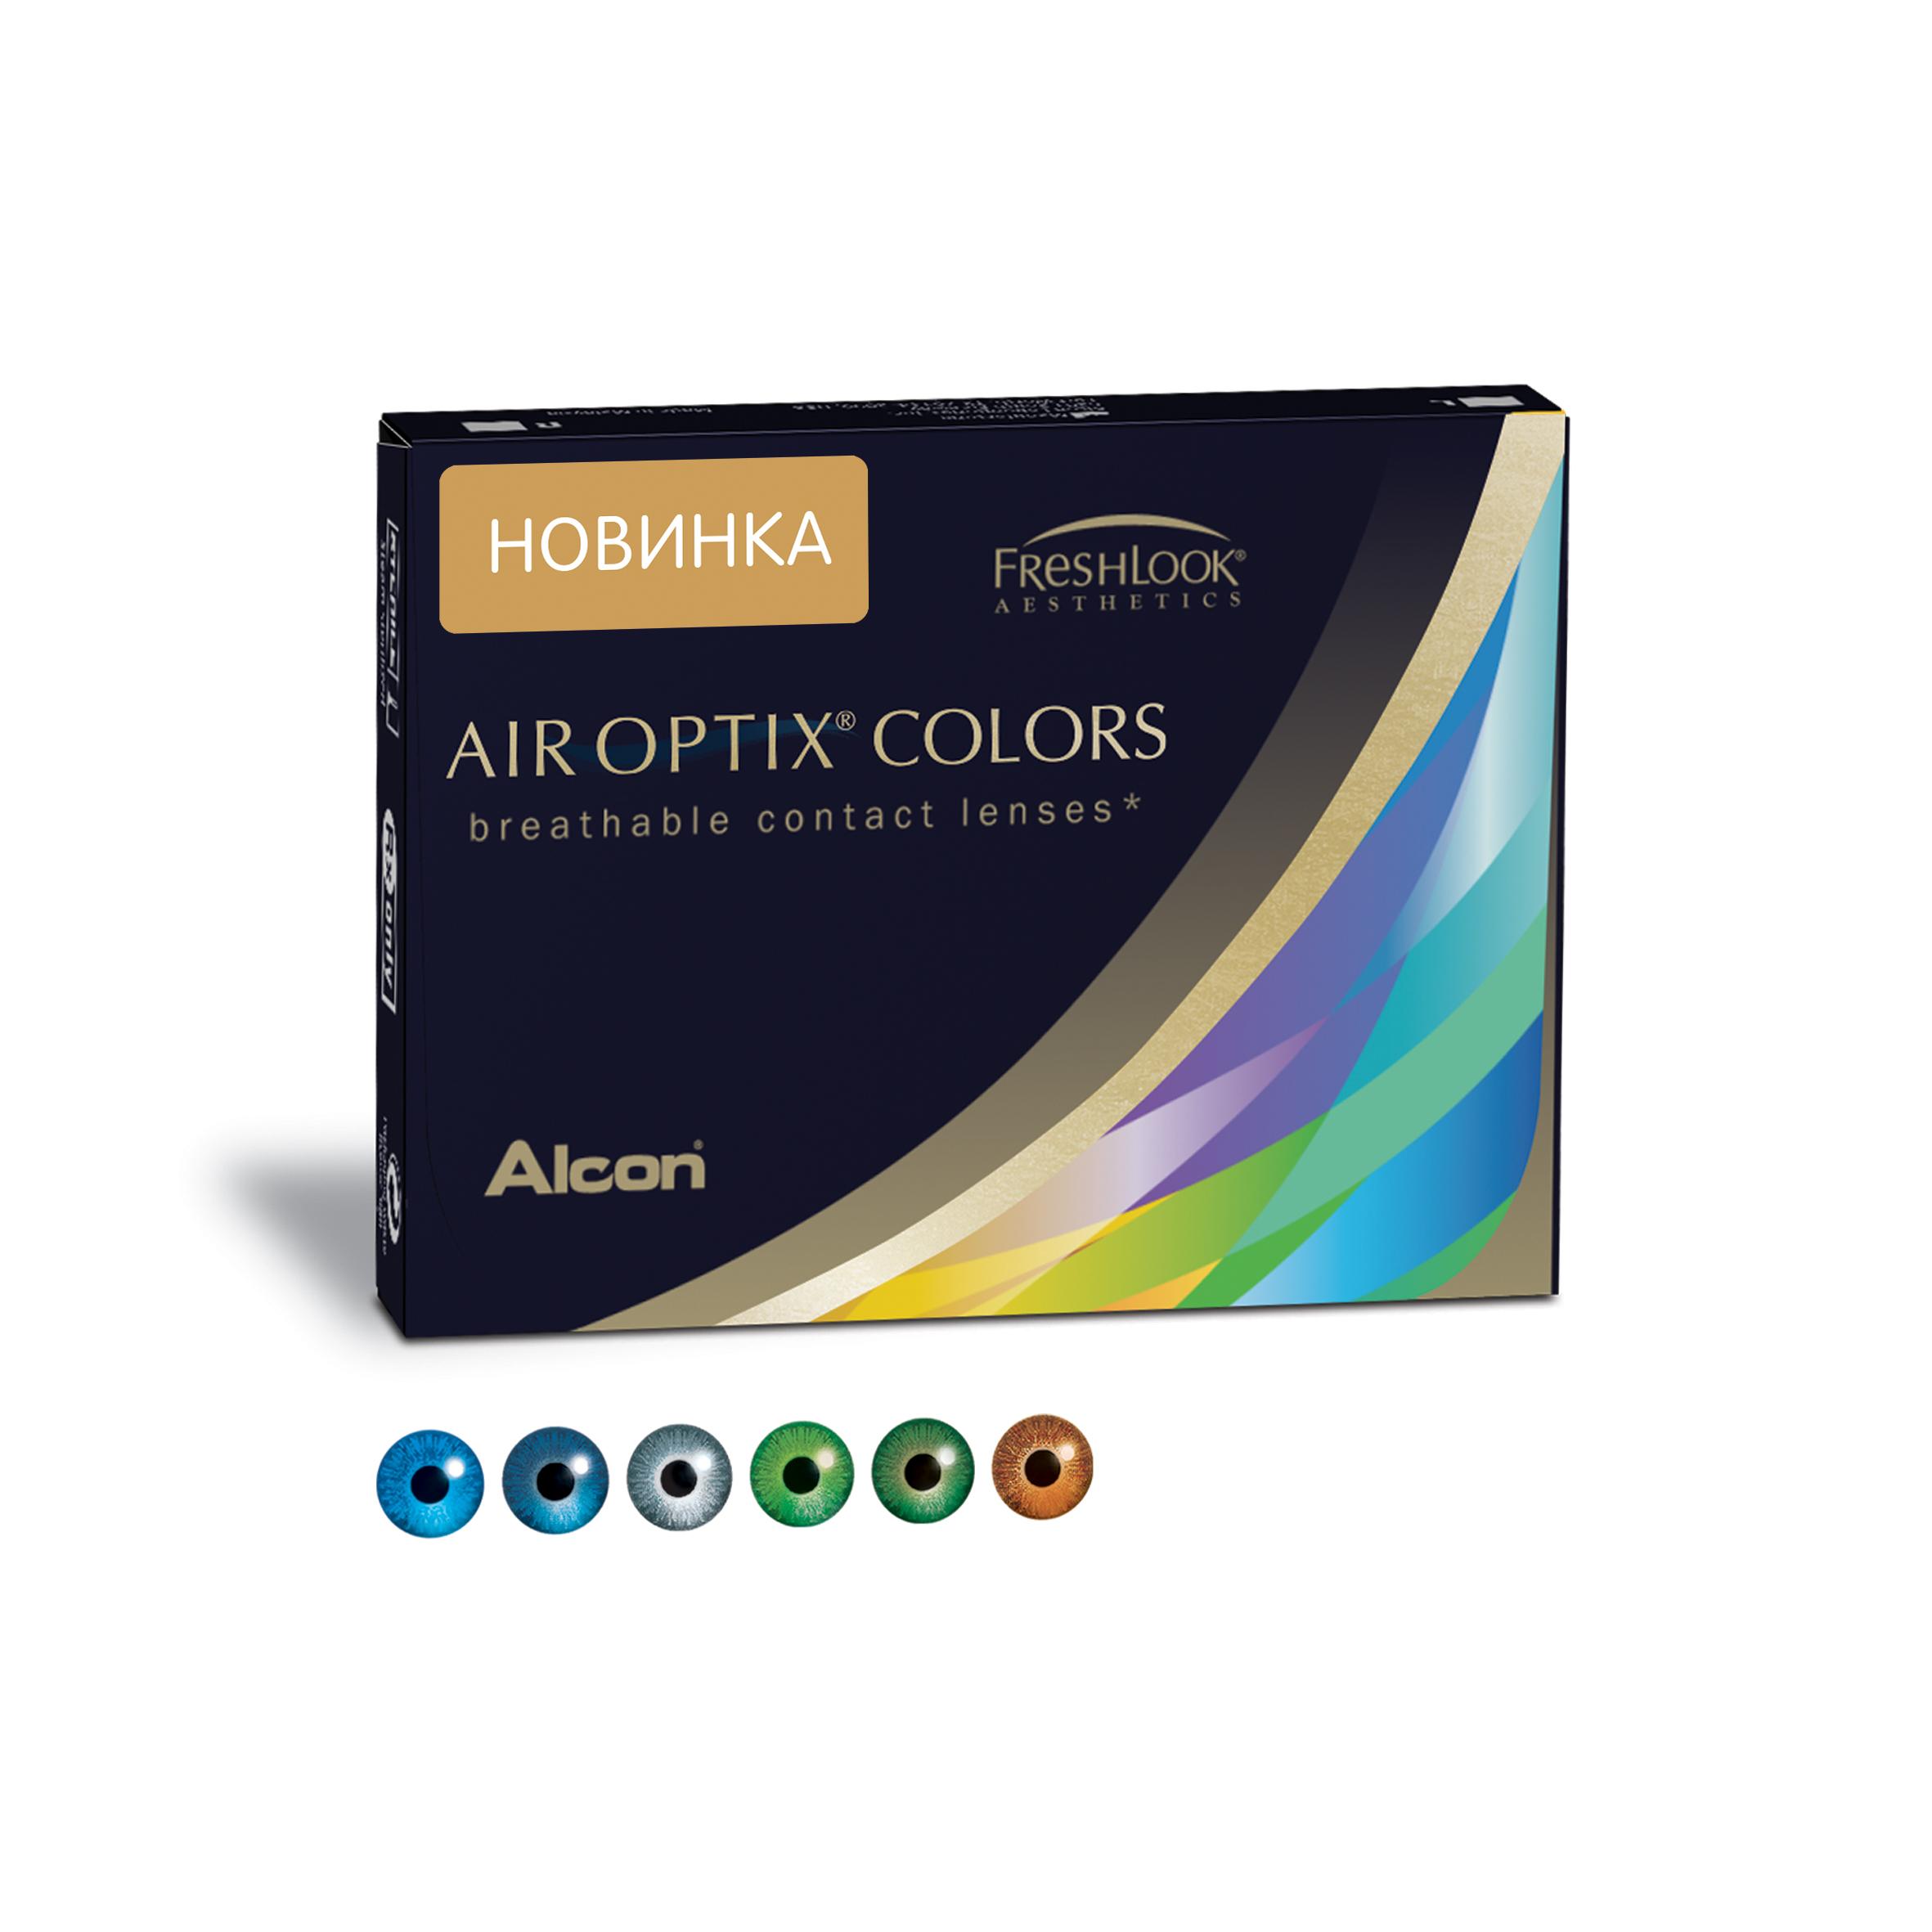 Аlcon контактные линзы Air Optix Colors 2 шт -6.00 Brilliant Blue31746302Мягкие контактные линзы